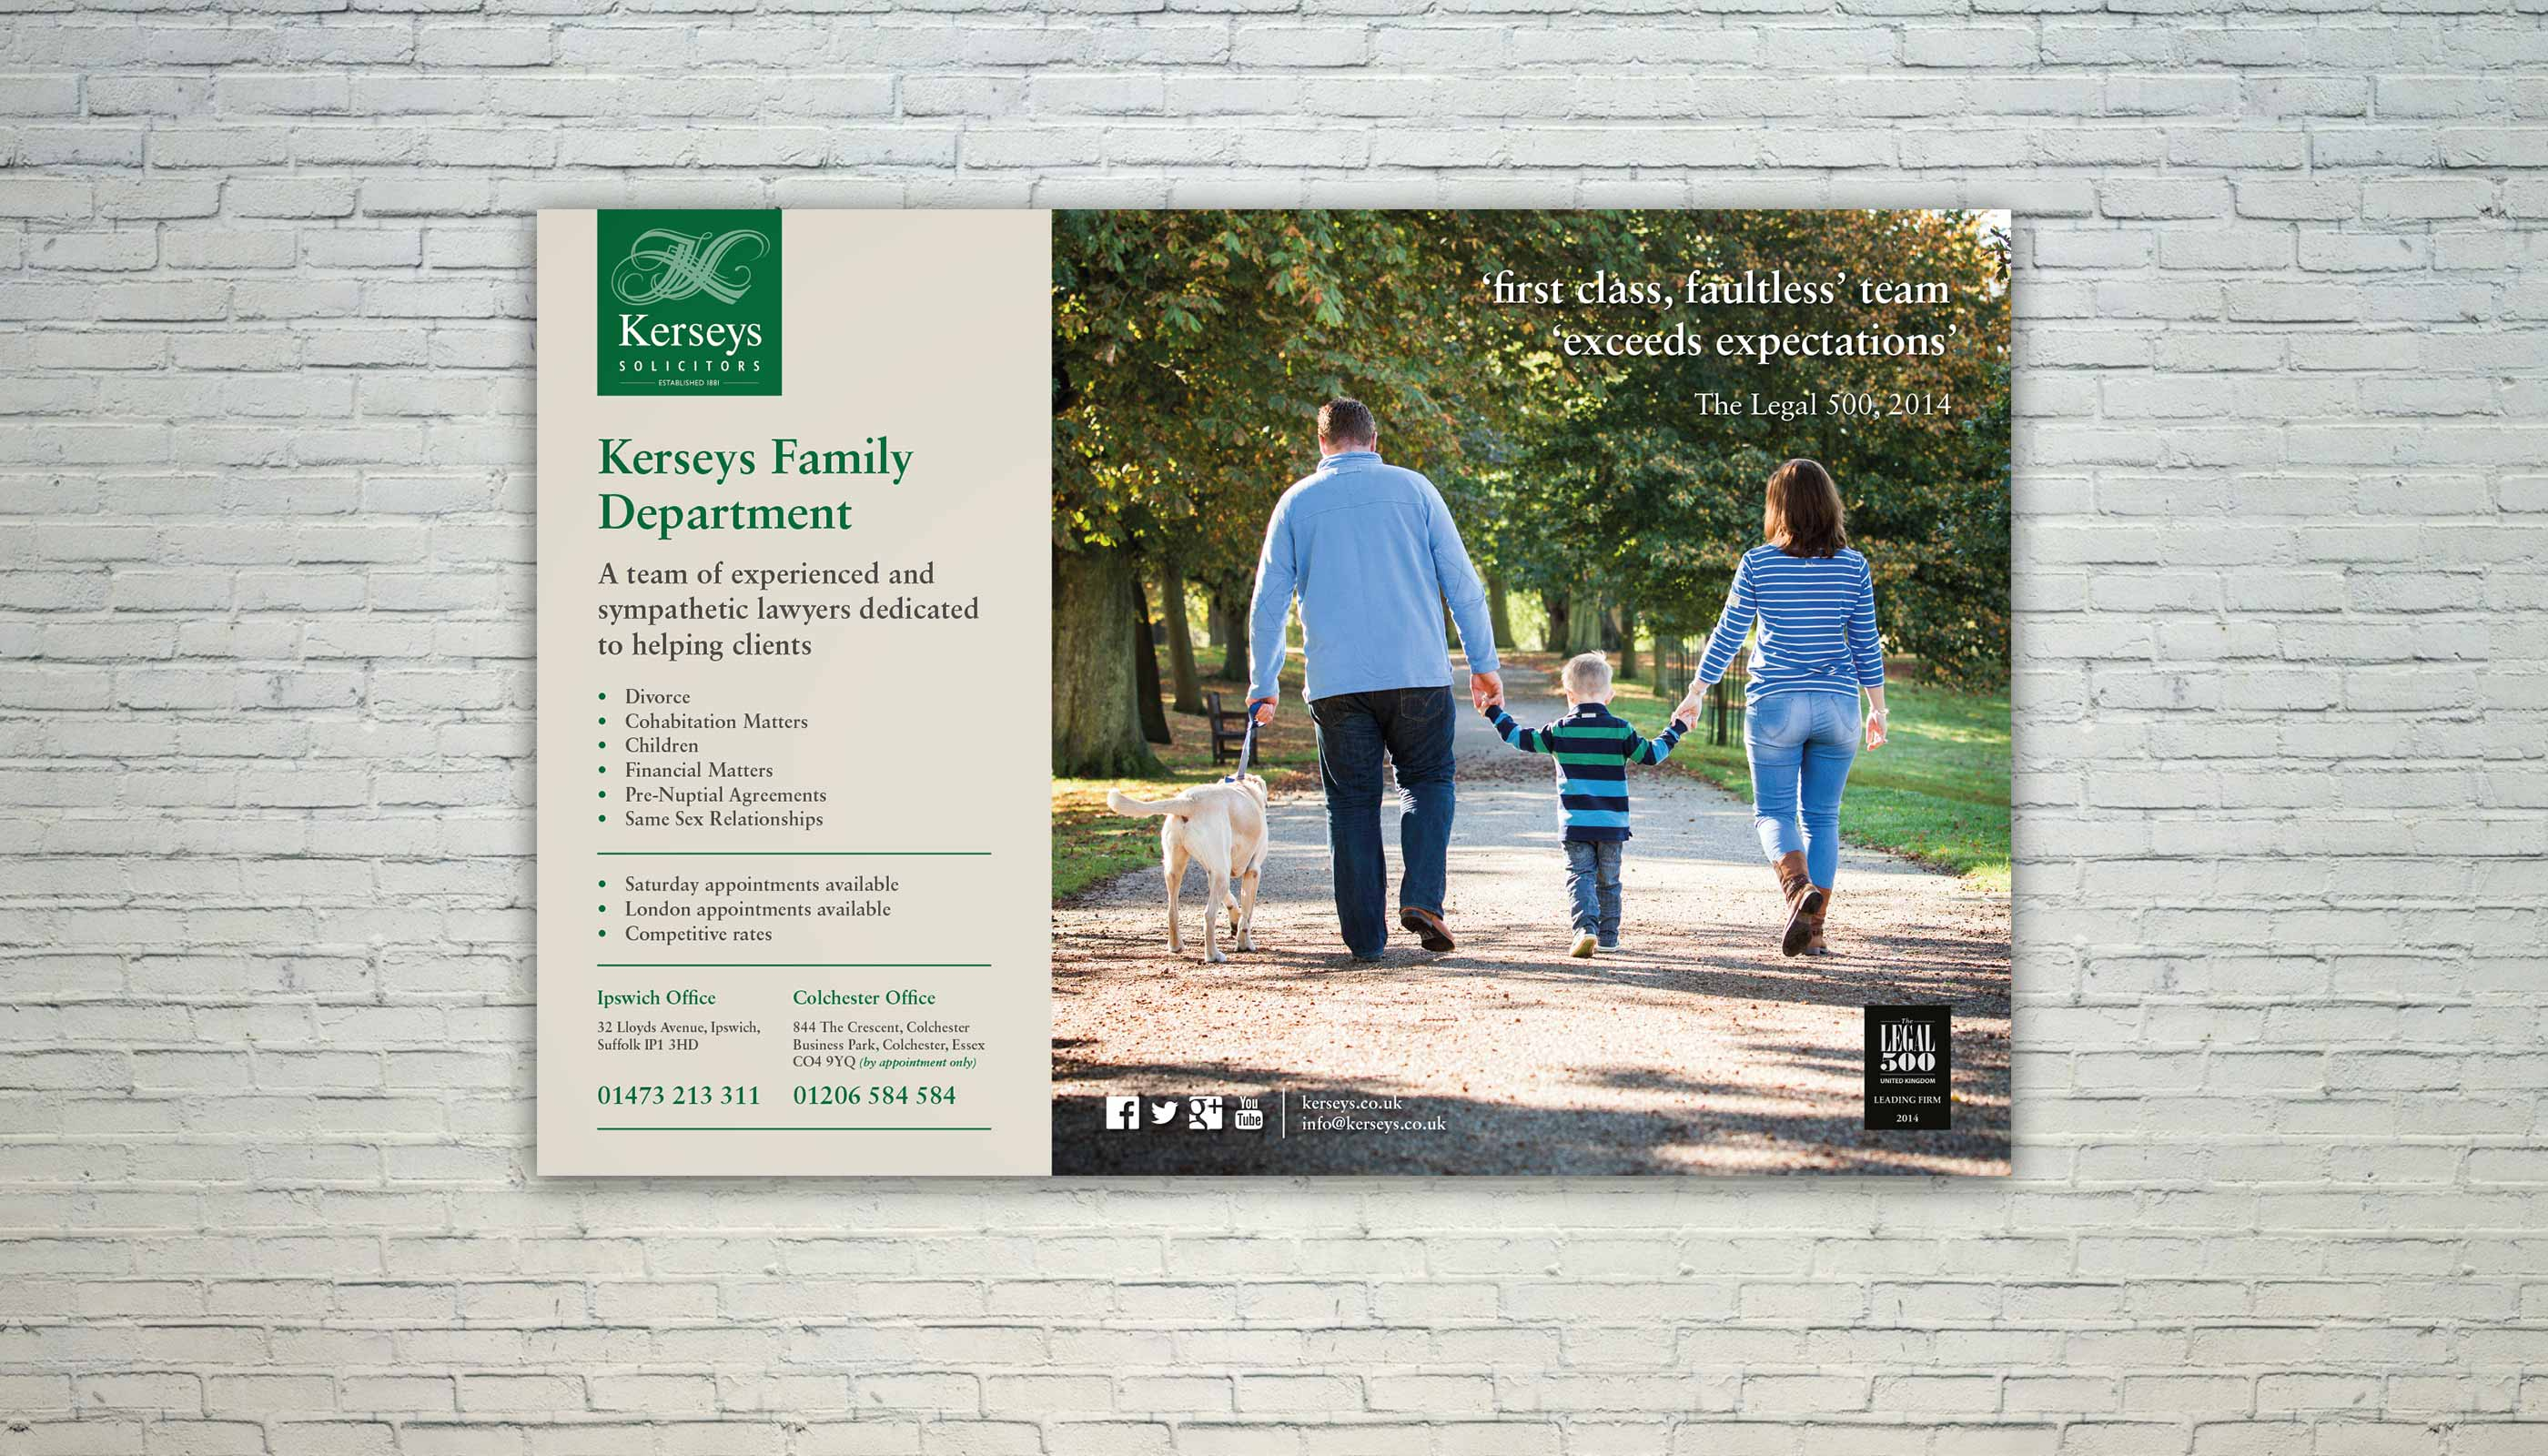 Train poster advert design for Kerseys Solicitors in Ipswich, Suffolk.